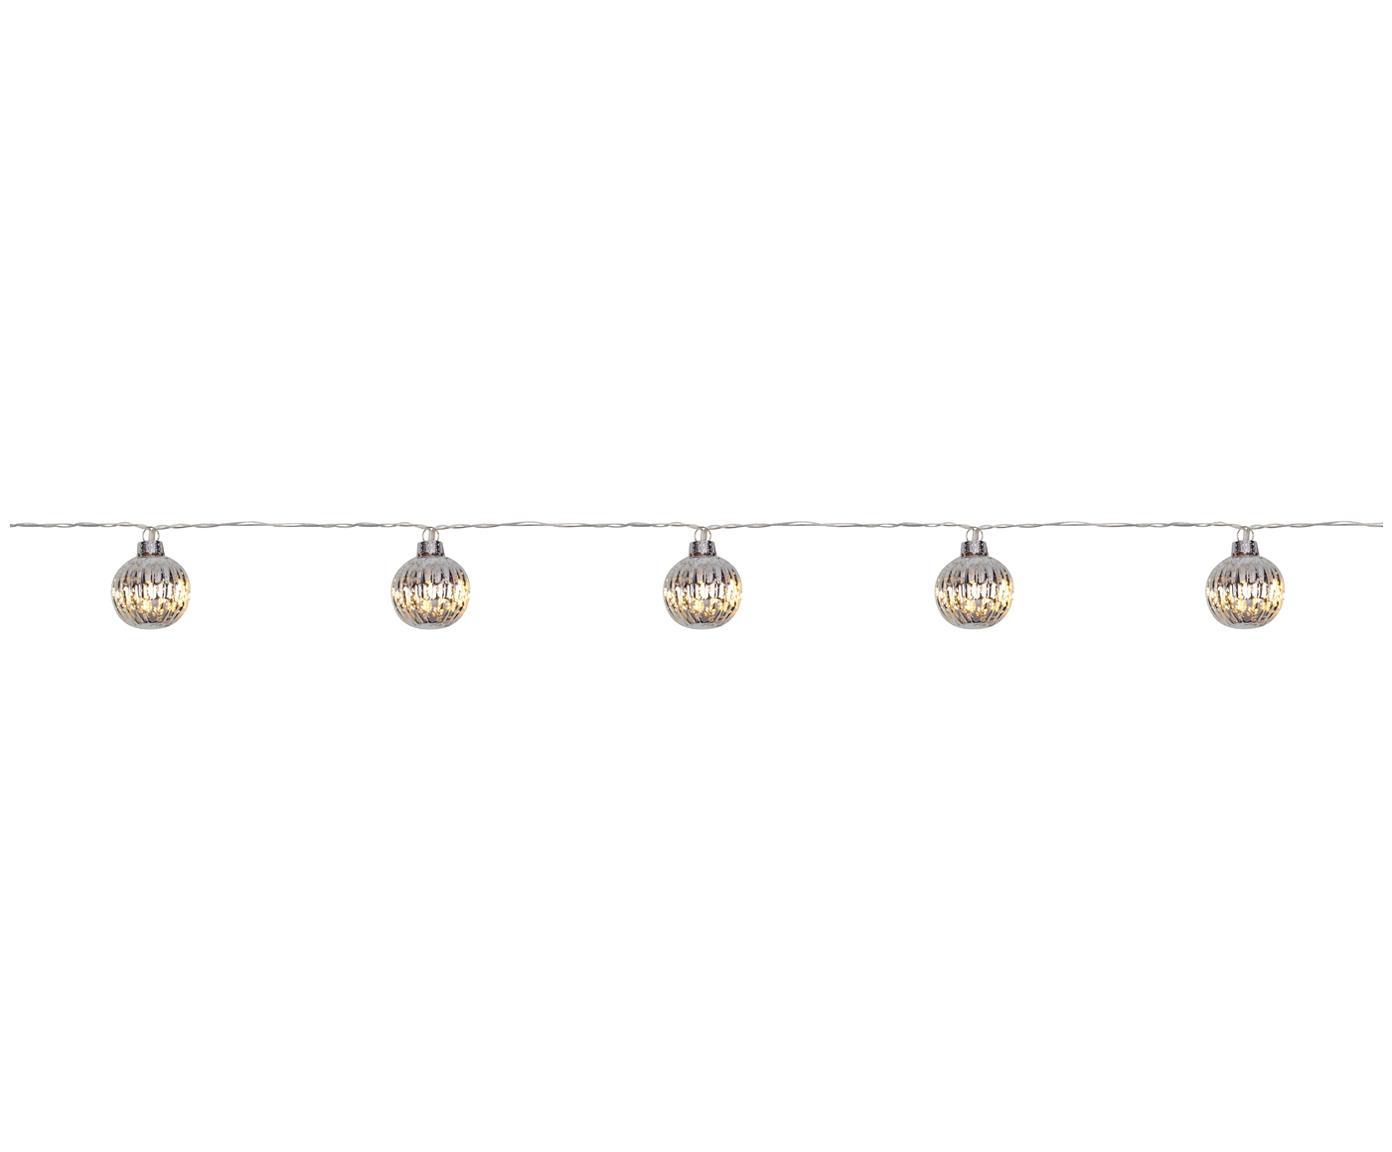 Ghirlanda a LED Solo, Paralume: vetro, Argento, Lung. 170 x Alt. 6 cm